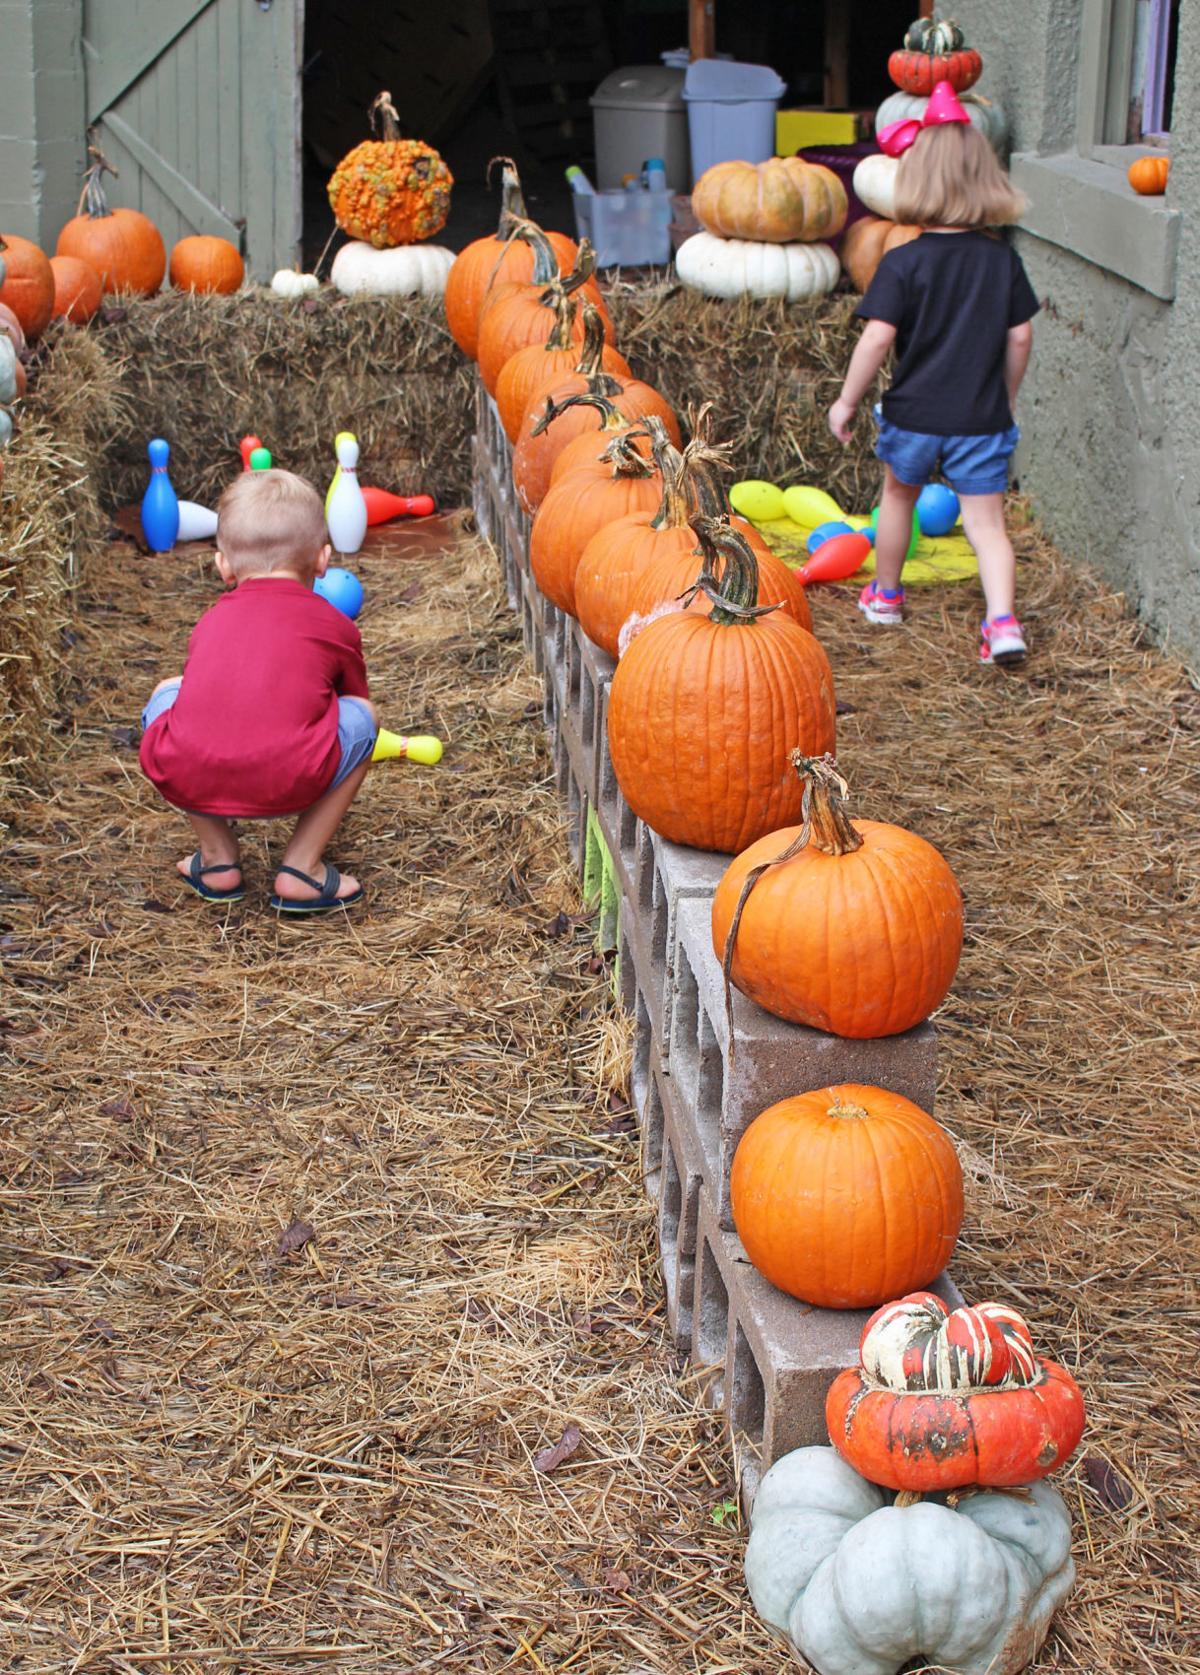 Pumpkin patch fun:The Square Root hosts City pumpkin patch   News ...